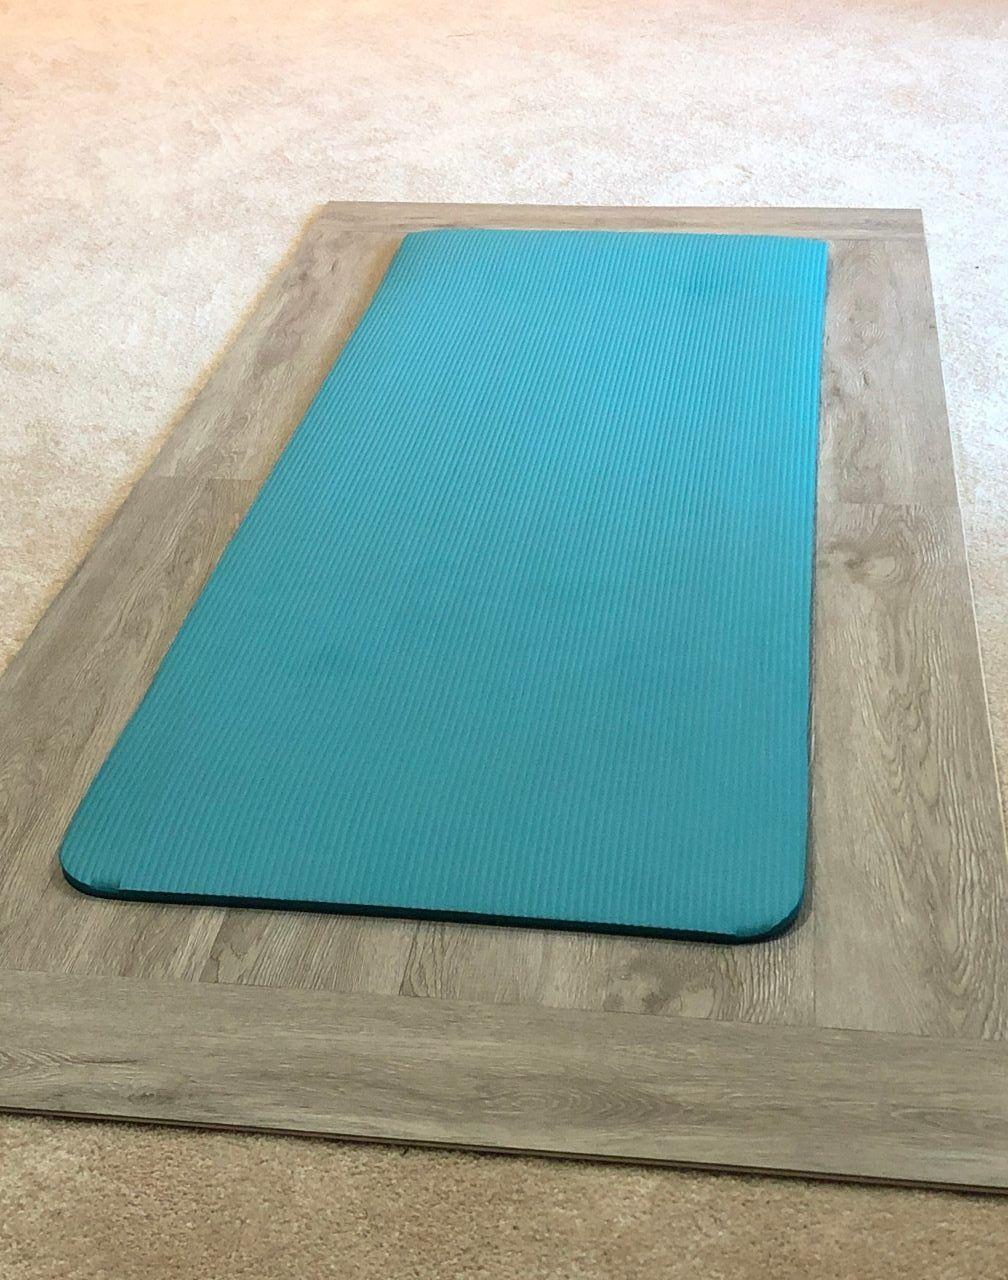 Diy yoga board for carpet practice in 2020 diy